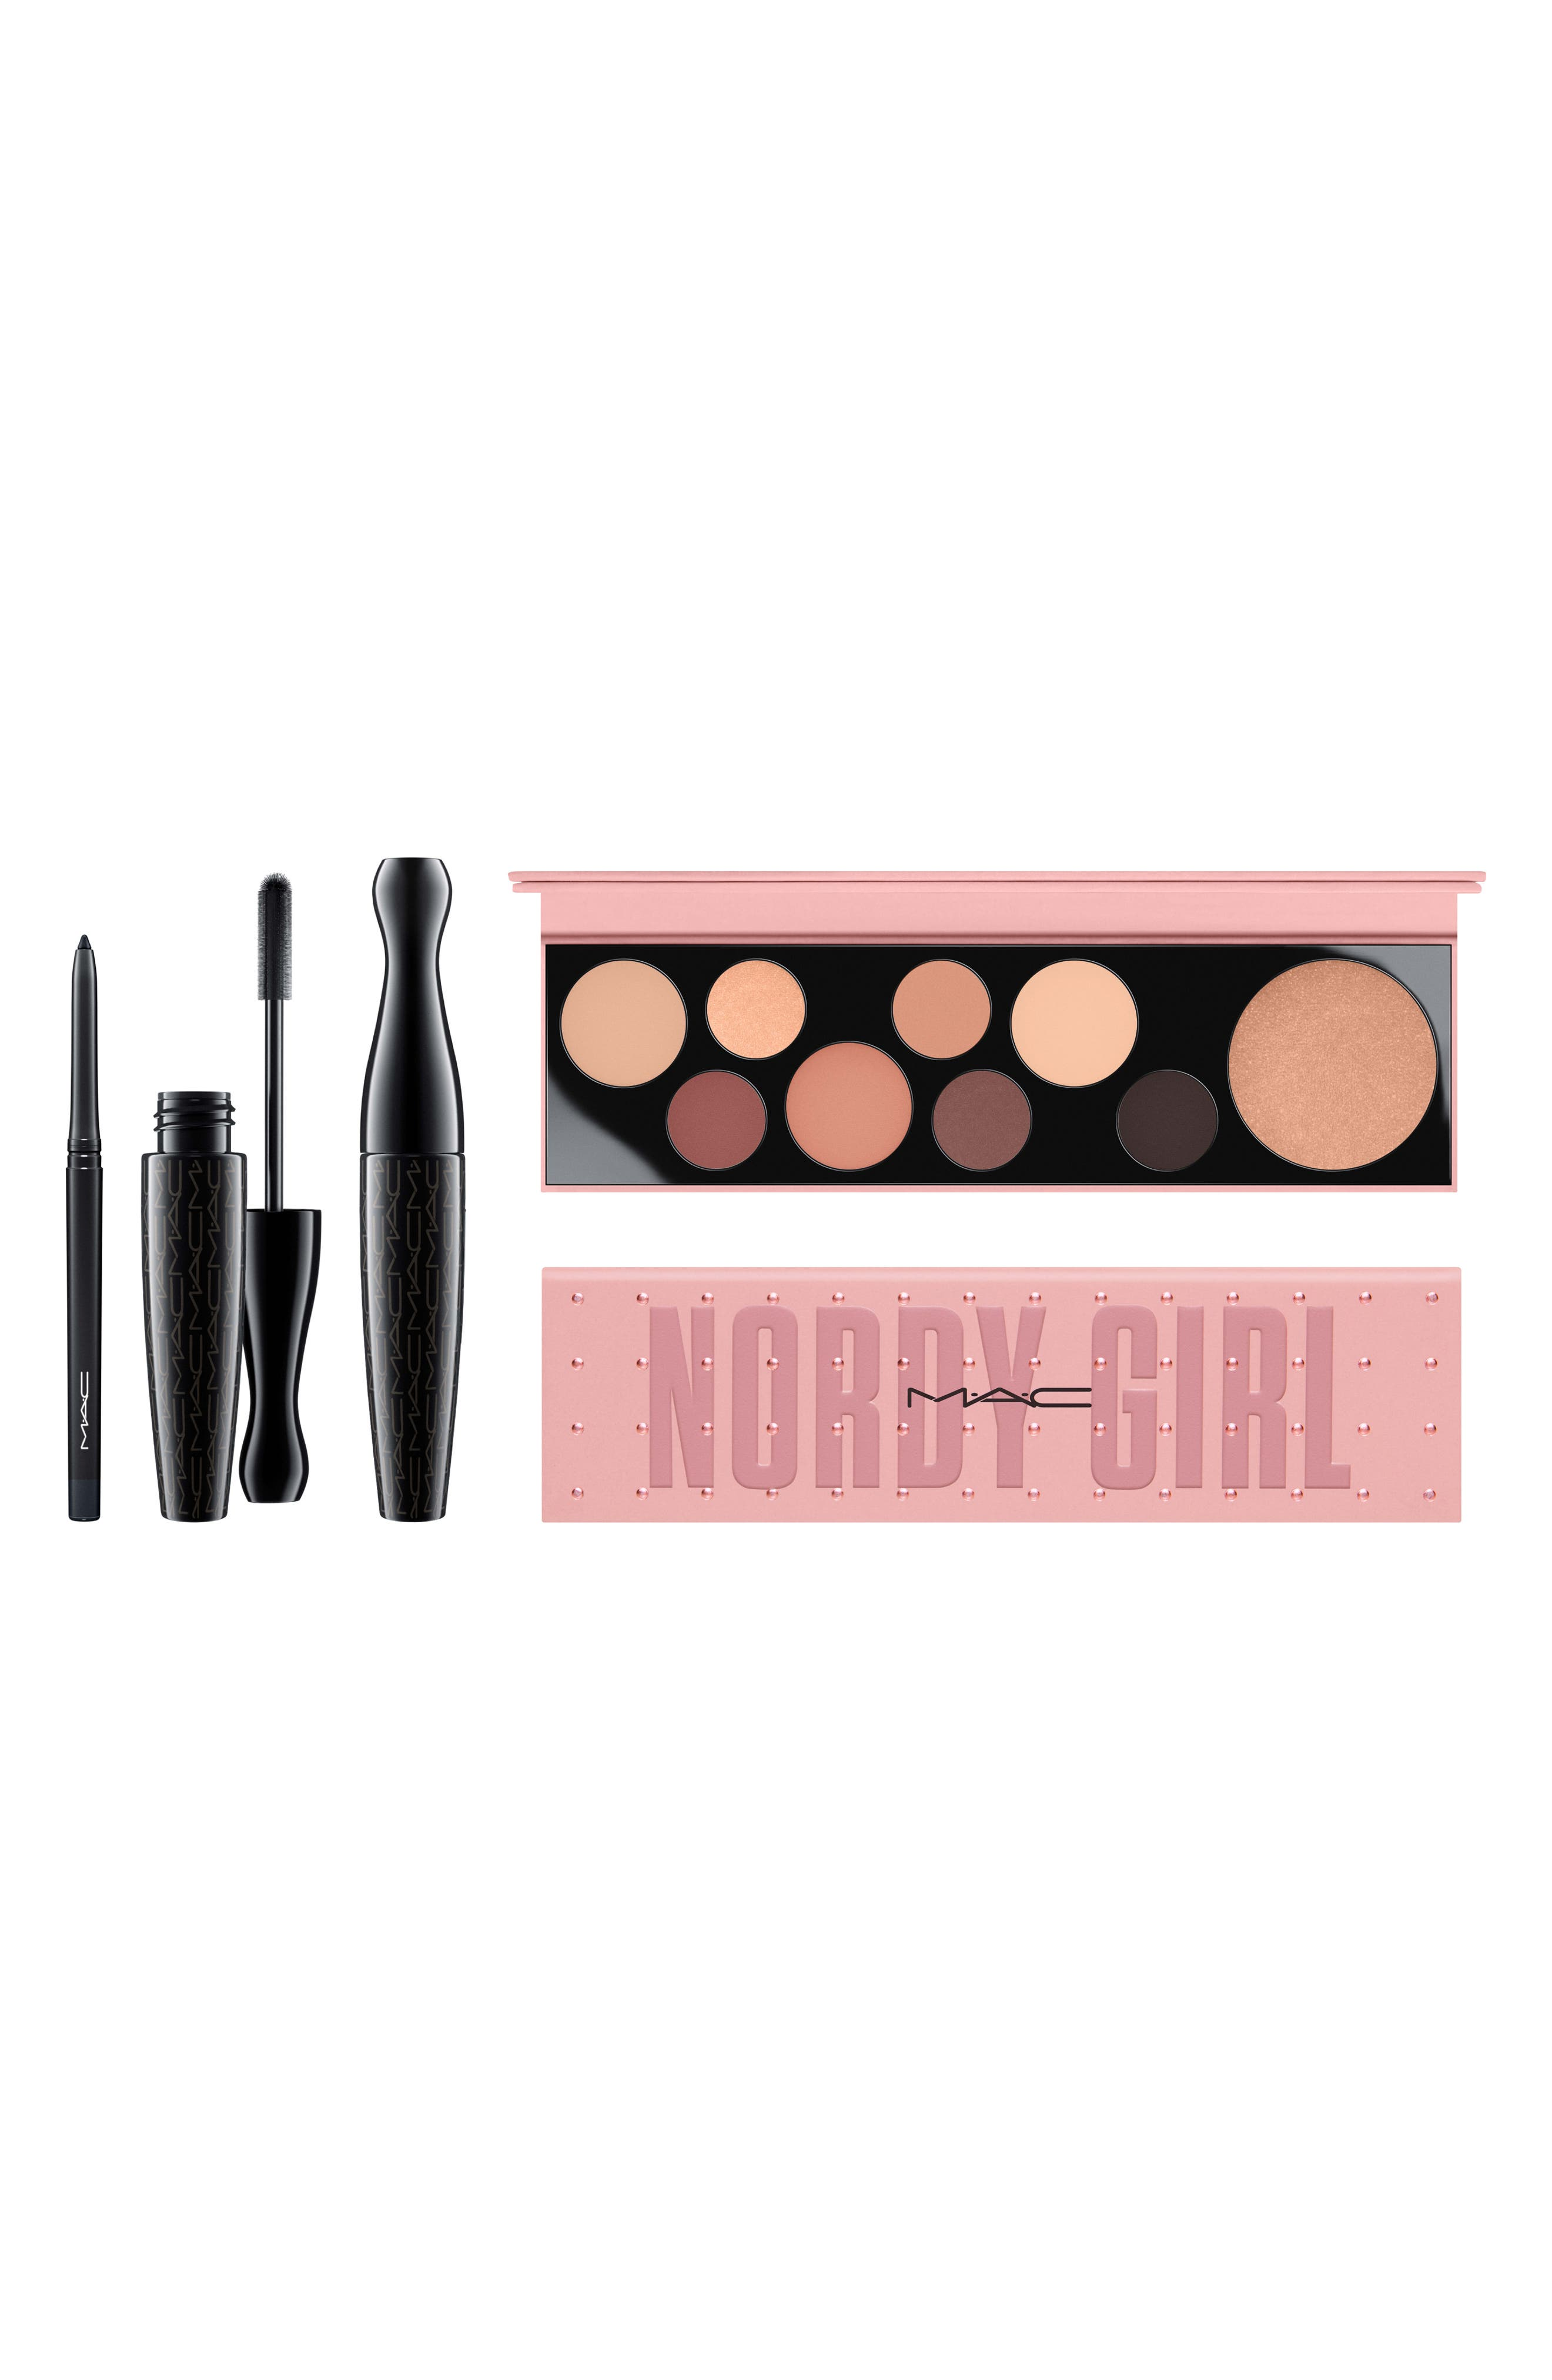 MAC Nordy Girl Matte Face & Eye Set,                         Main,                         color, 000